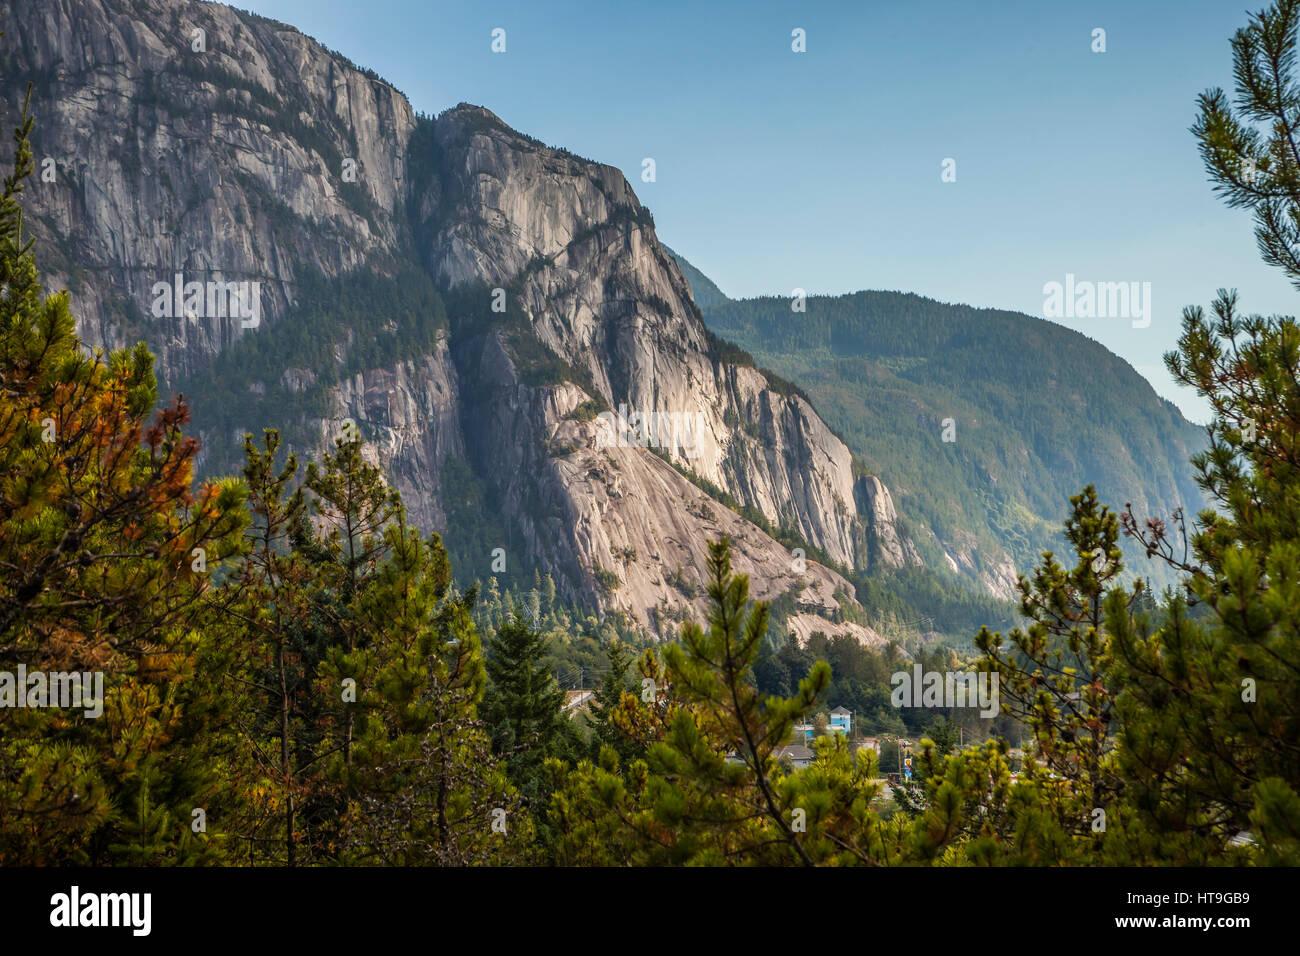 Le chef, un monolithe de granite / mountain au dessus de Squamish, British Columbia, Canada. Photo Stock